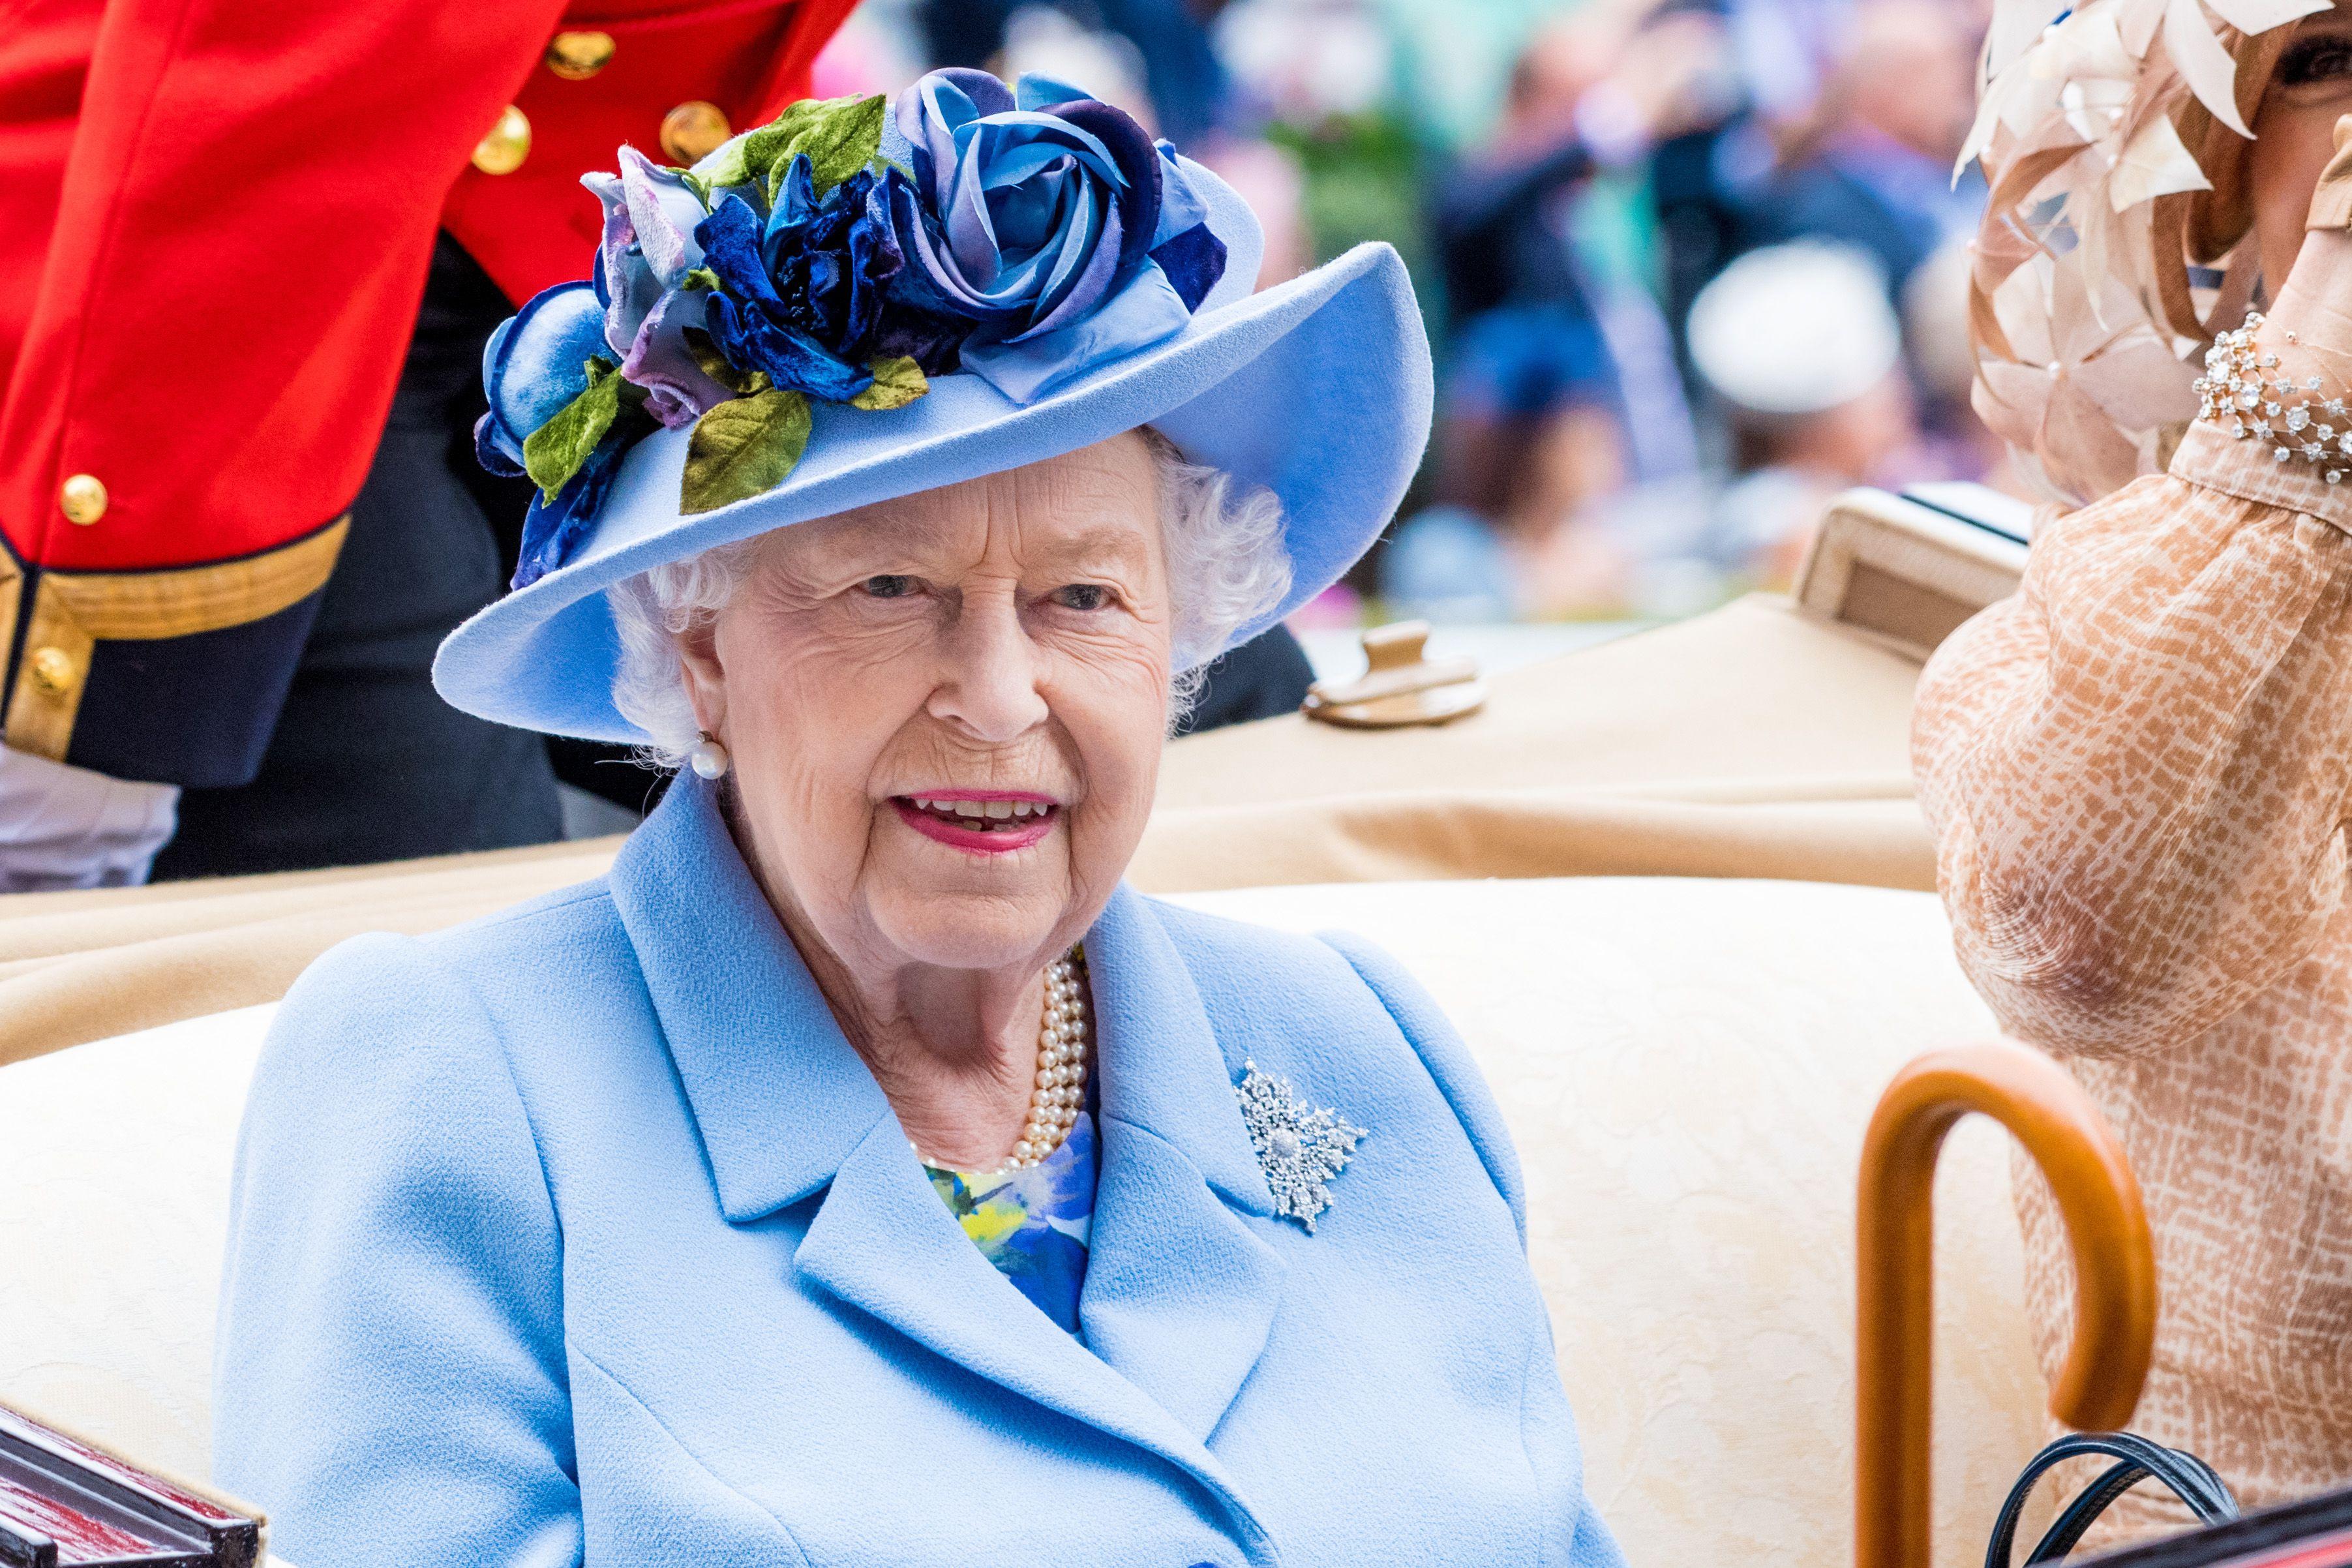 Photos of the Royal Ascot 2019